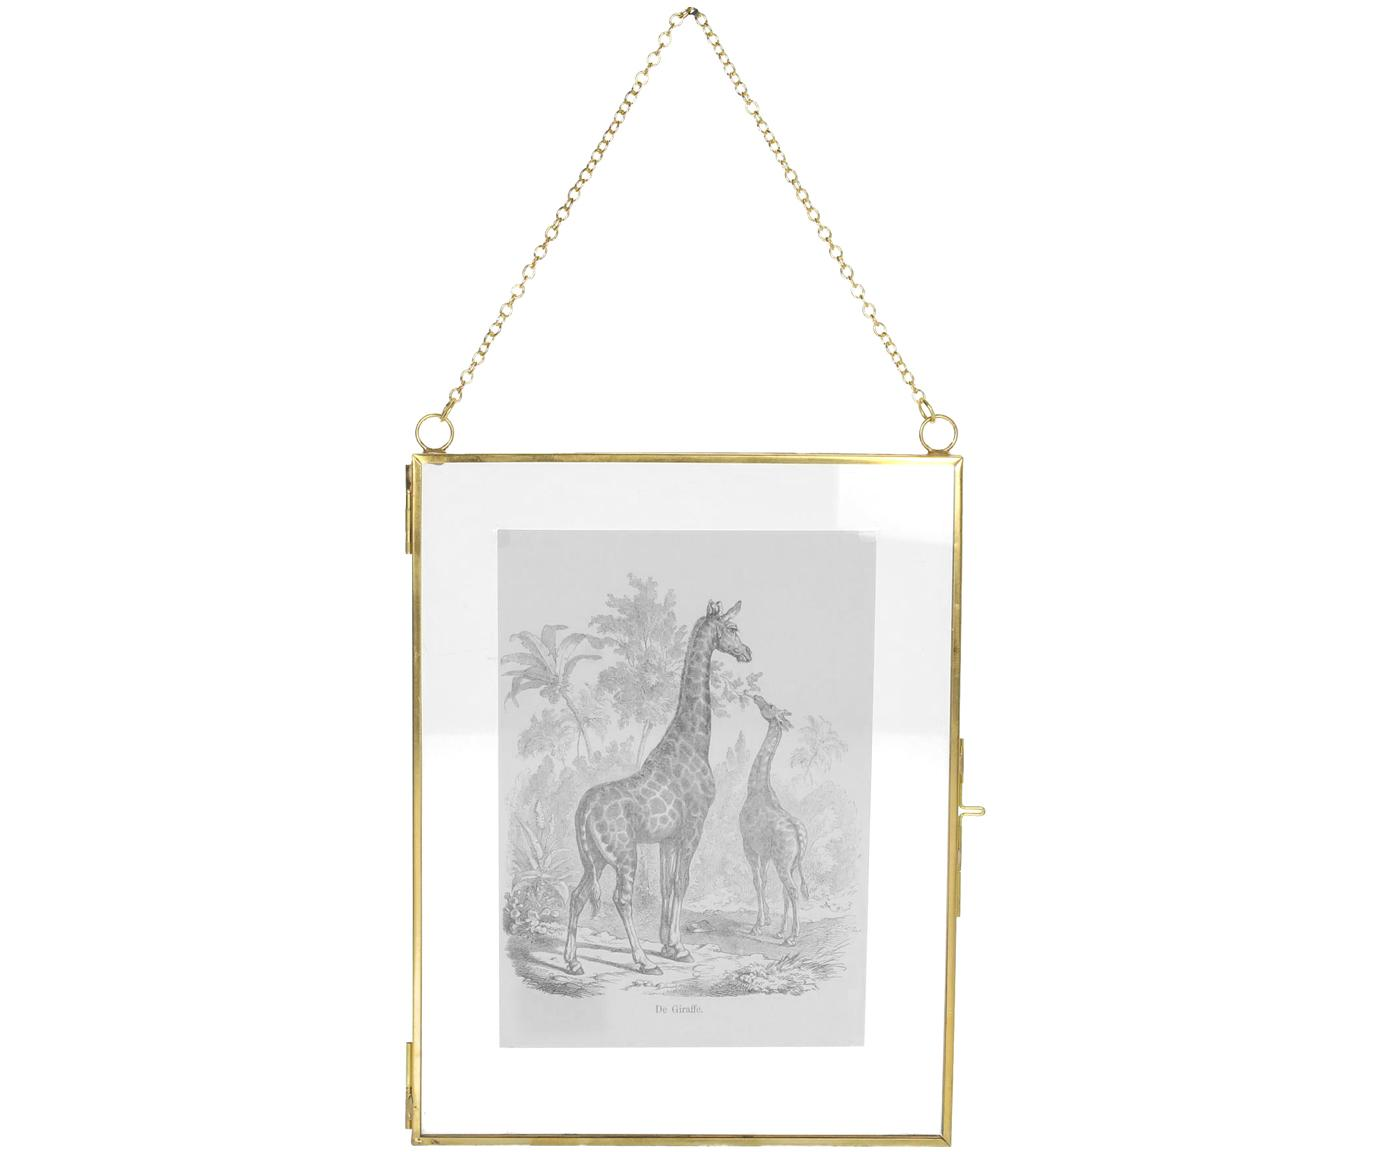 Fotolijstje Linetti, Messingkleurig, 13 x 18 cm